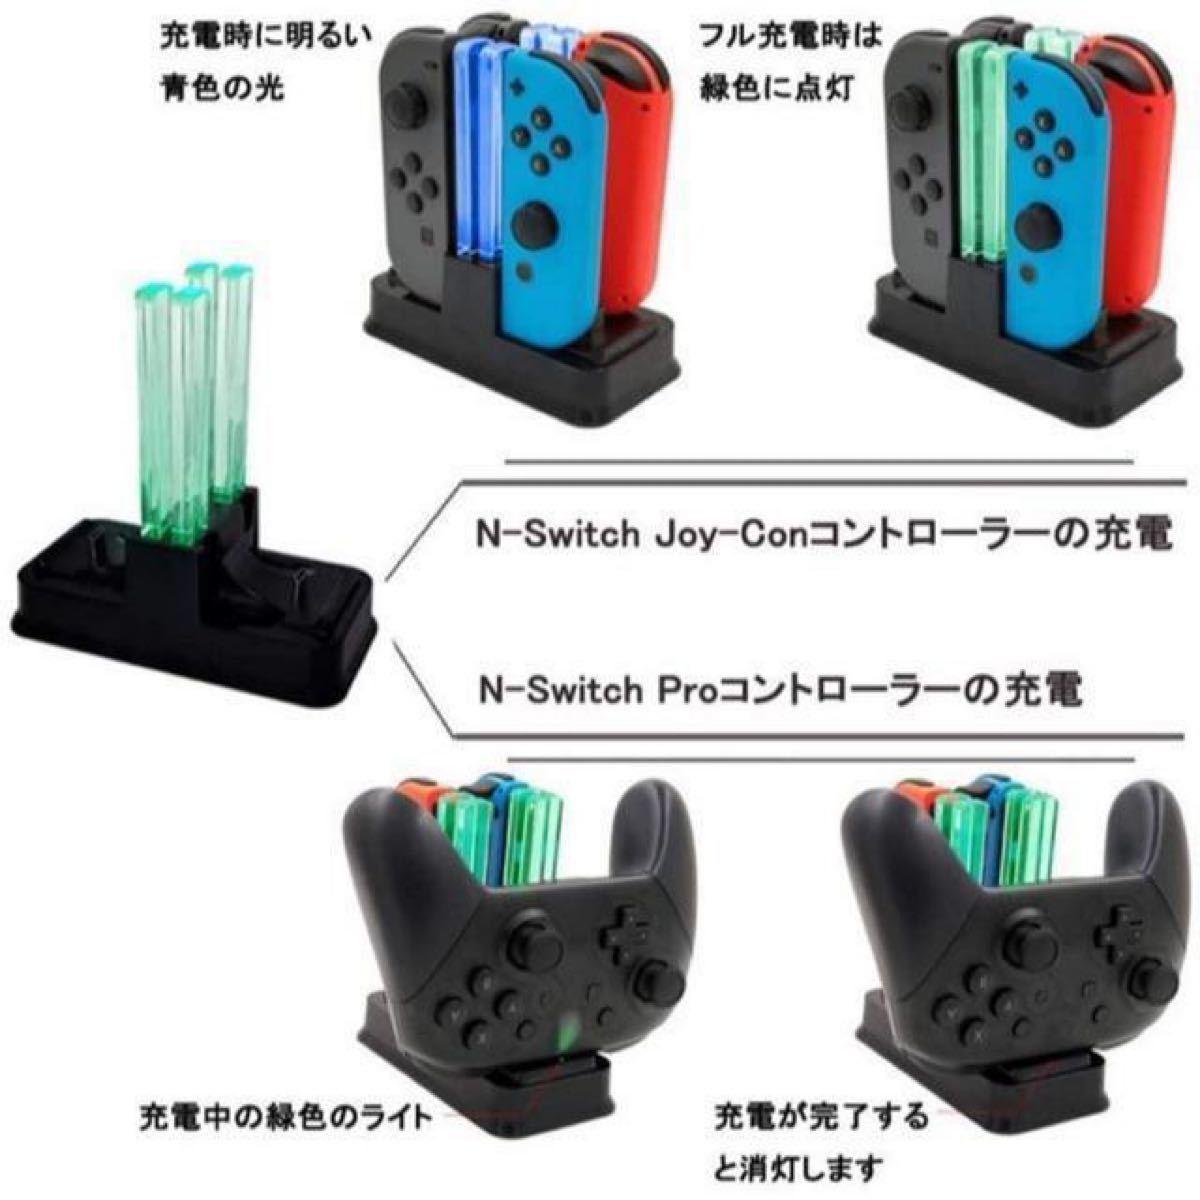 Joy-Con Nintendo Switch 充電スタンド 任天堂 ソフト